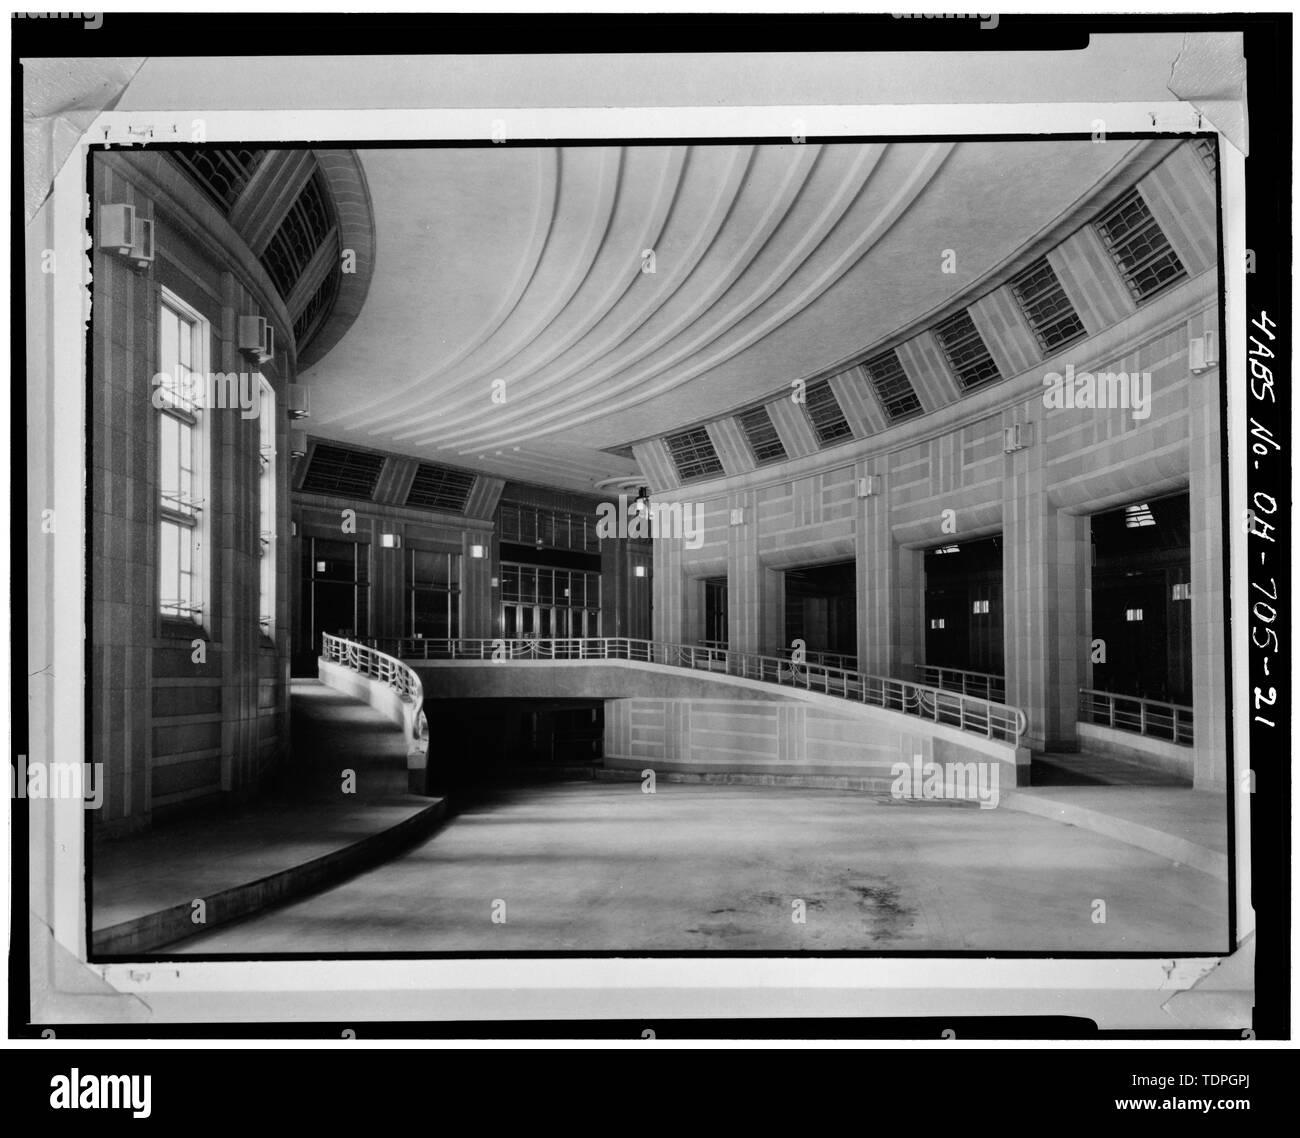 TAXI ENTRANCE (NORTH) RAMP, LOOKING SOUTH - Cincinnati Union Terminal, 1301 Western Avenue, Cincinnati, Hamilton County, OH - Stock Image